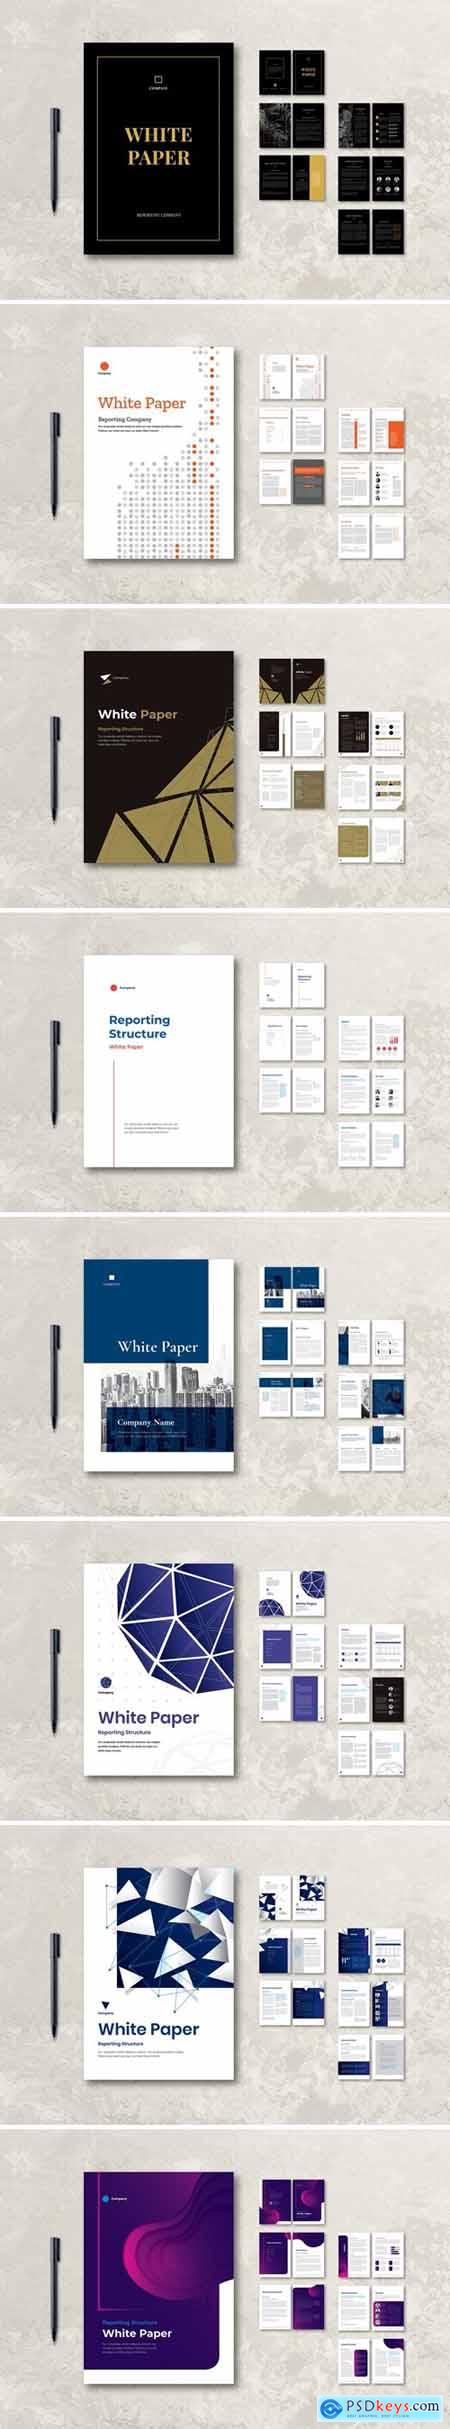 White Paper Company Report Bundle